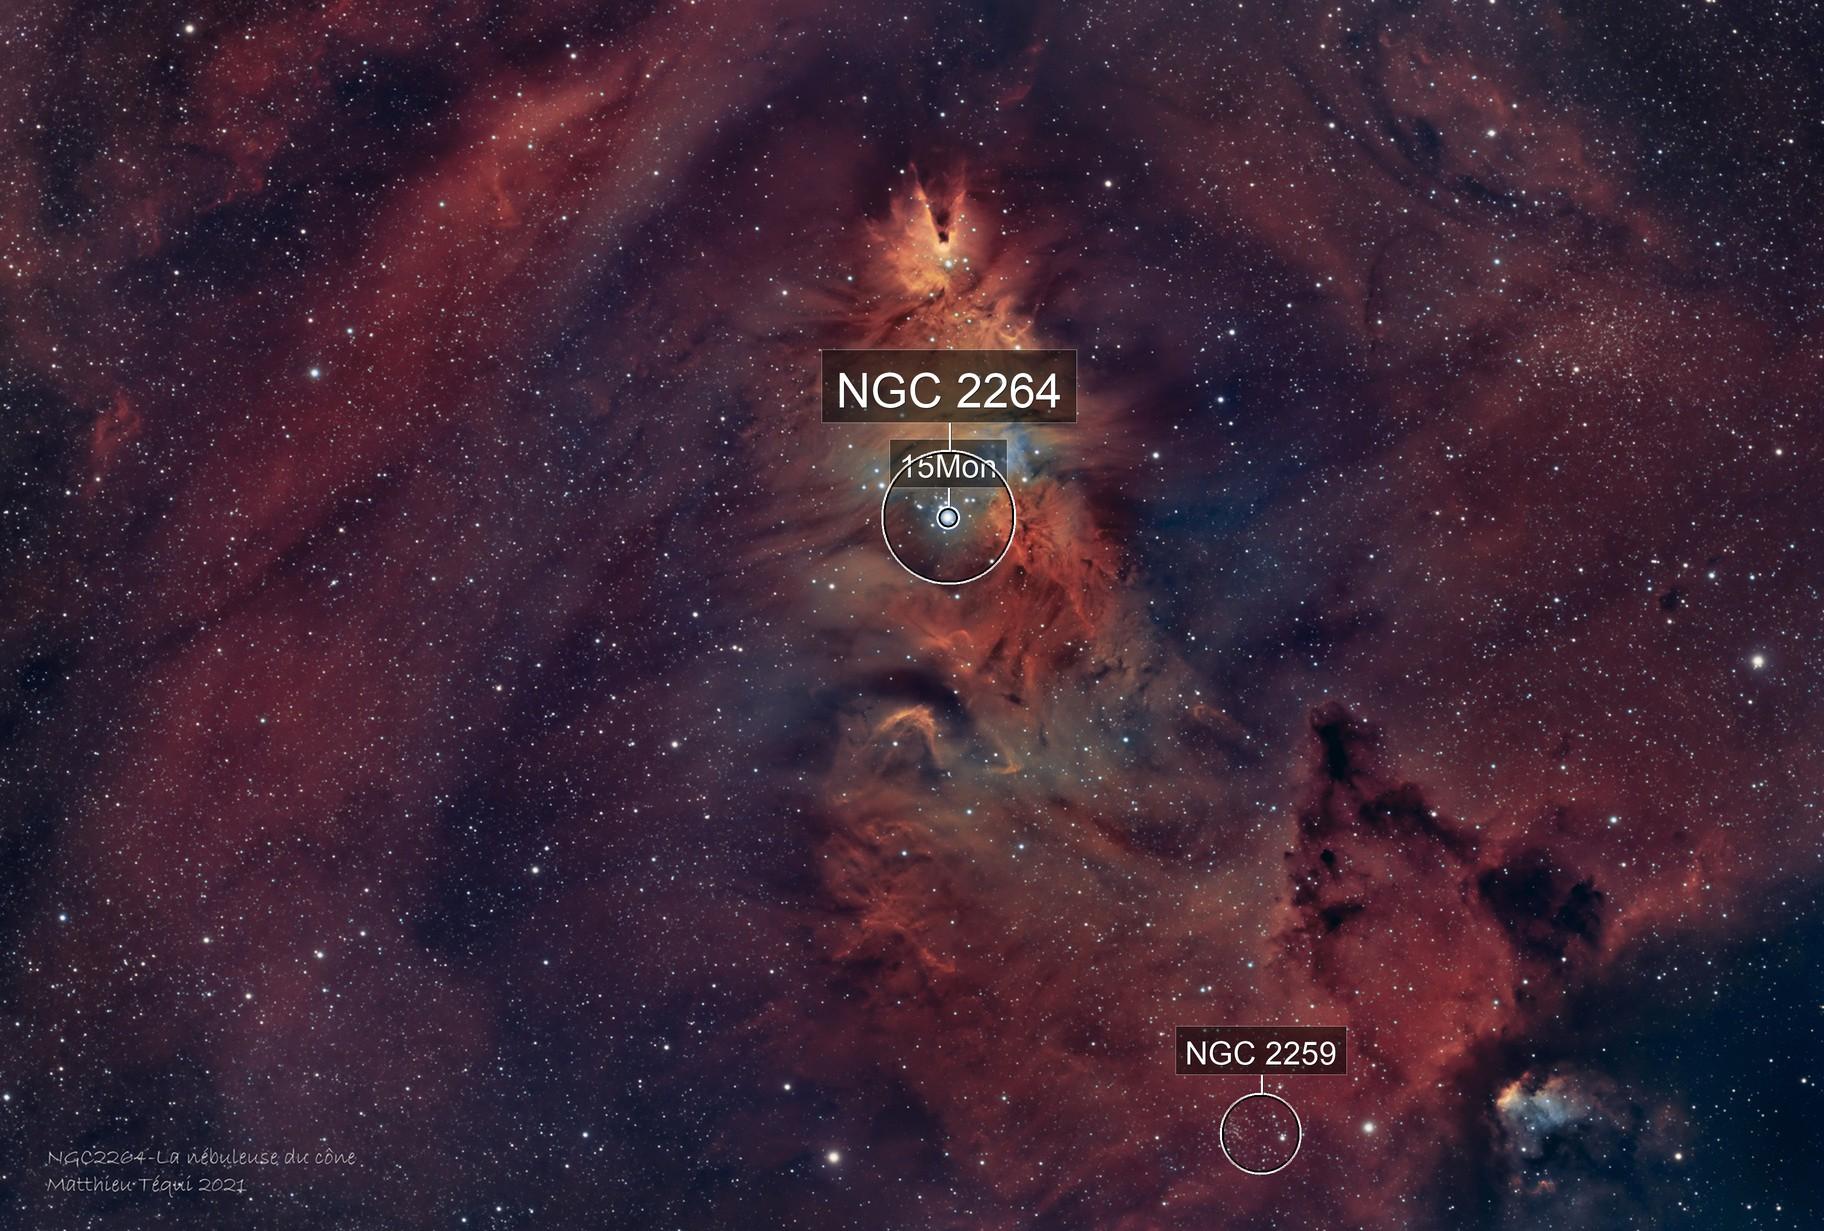 NGC 2264-la nébuleuse du cône HOO